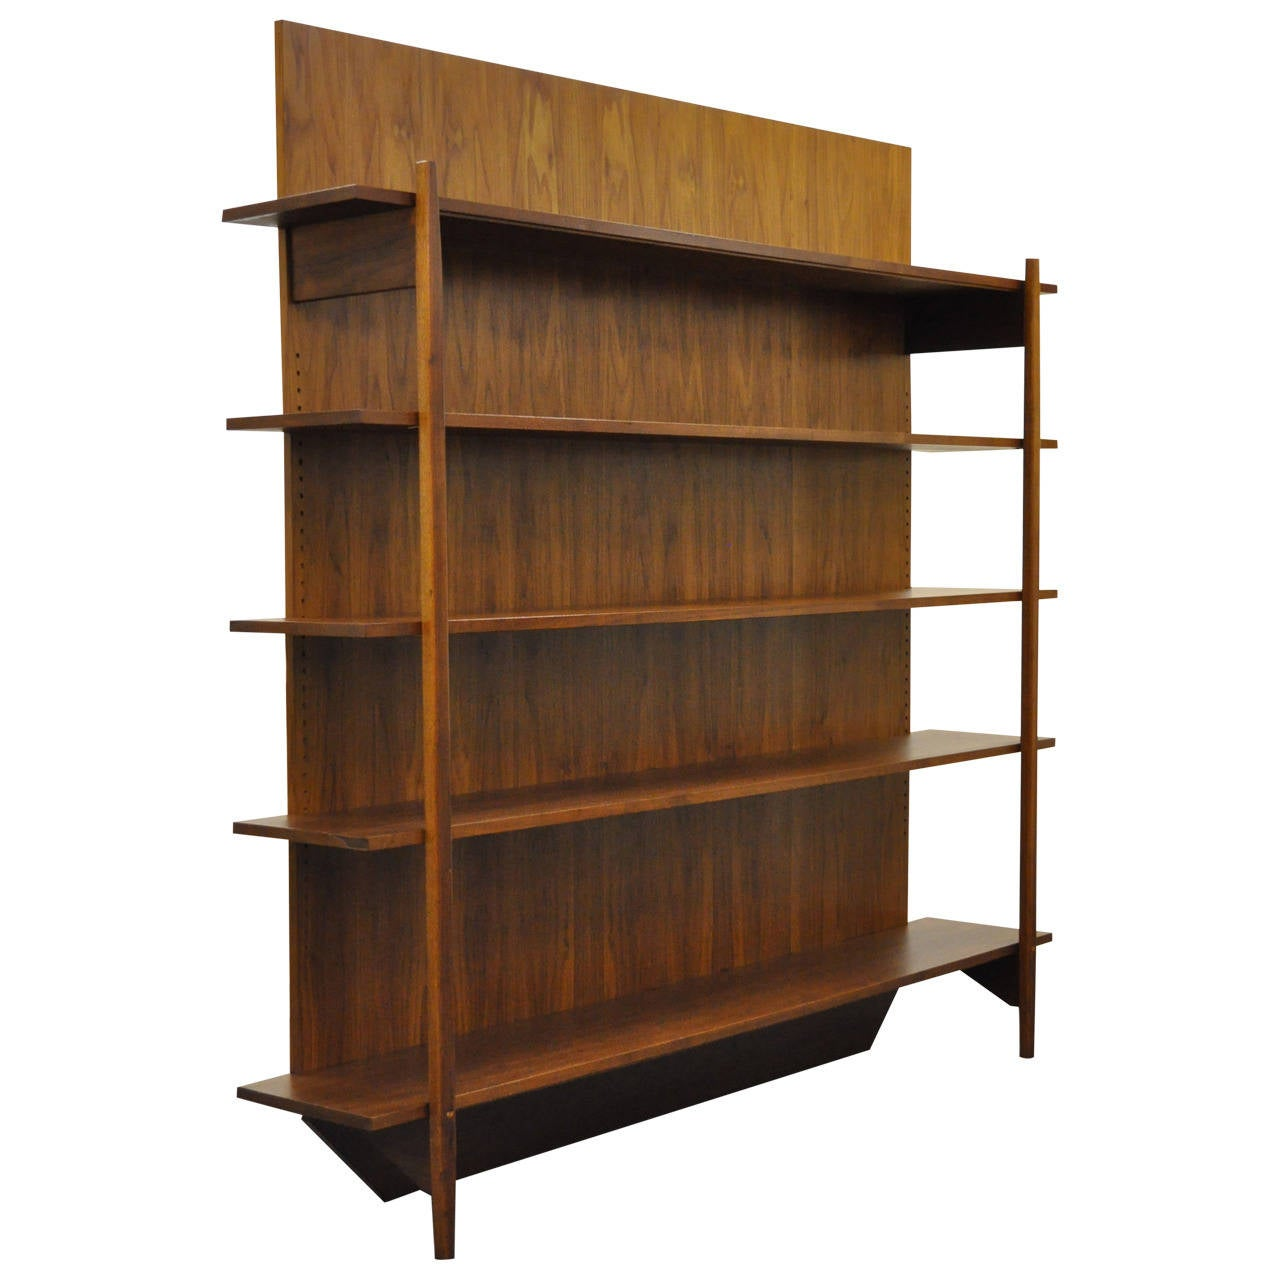 Custom-Crafted Mid-Century Modern Teak Bookcase In The Danish Taste 1